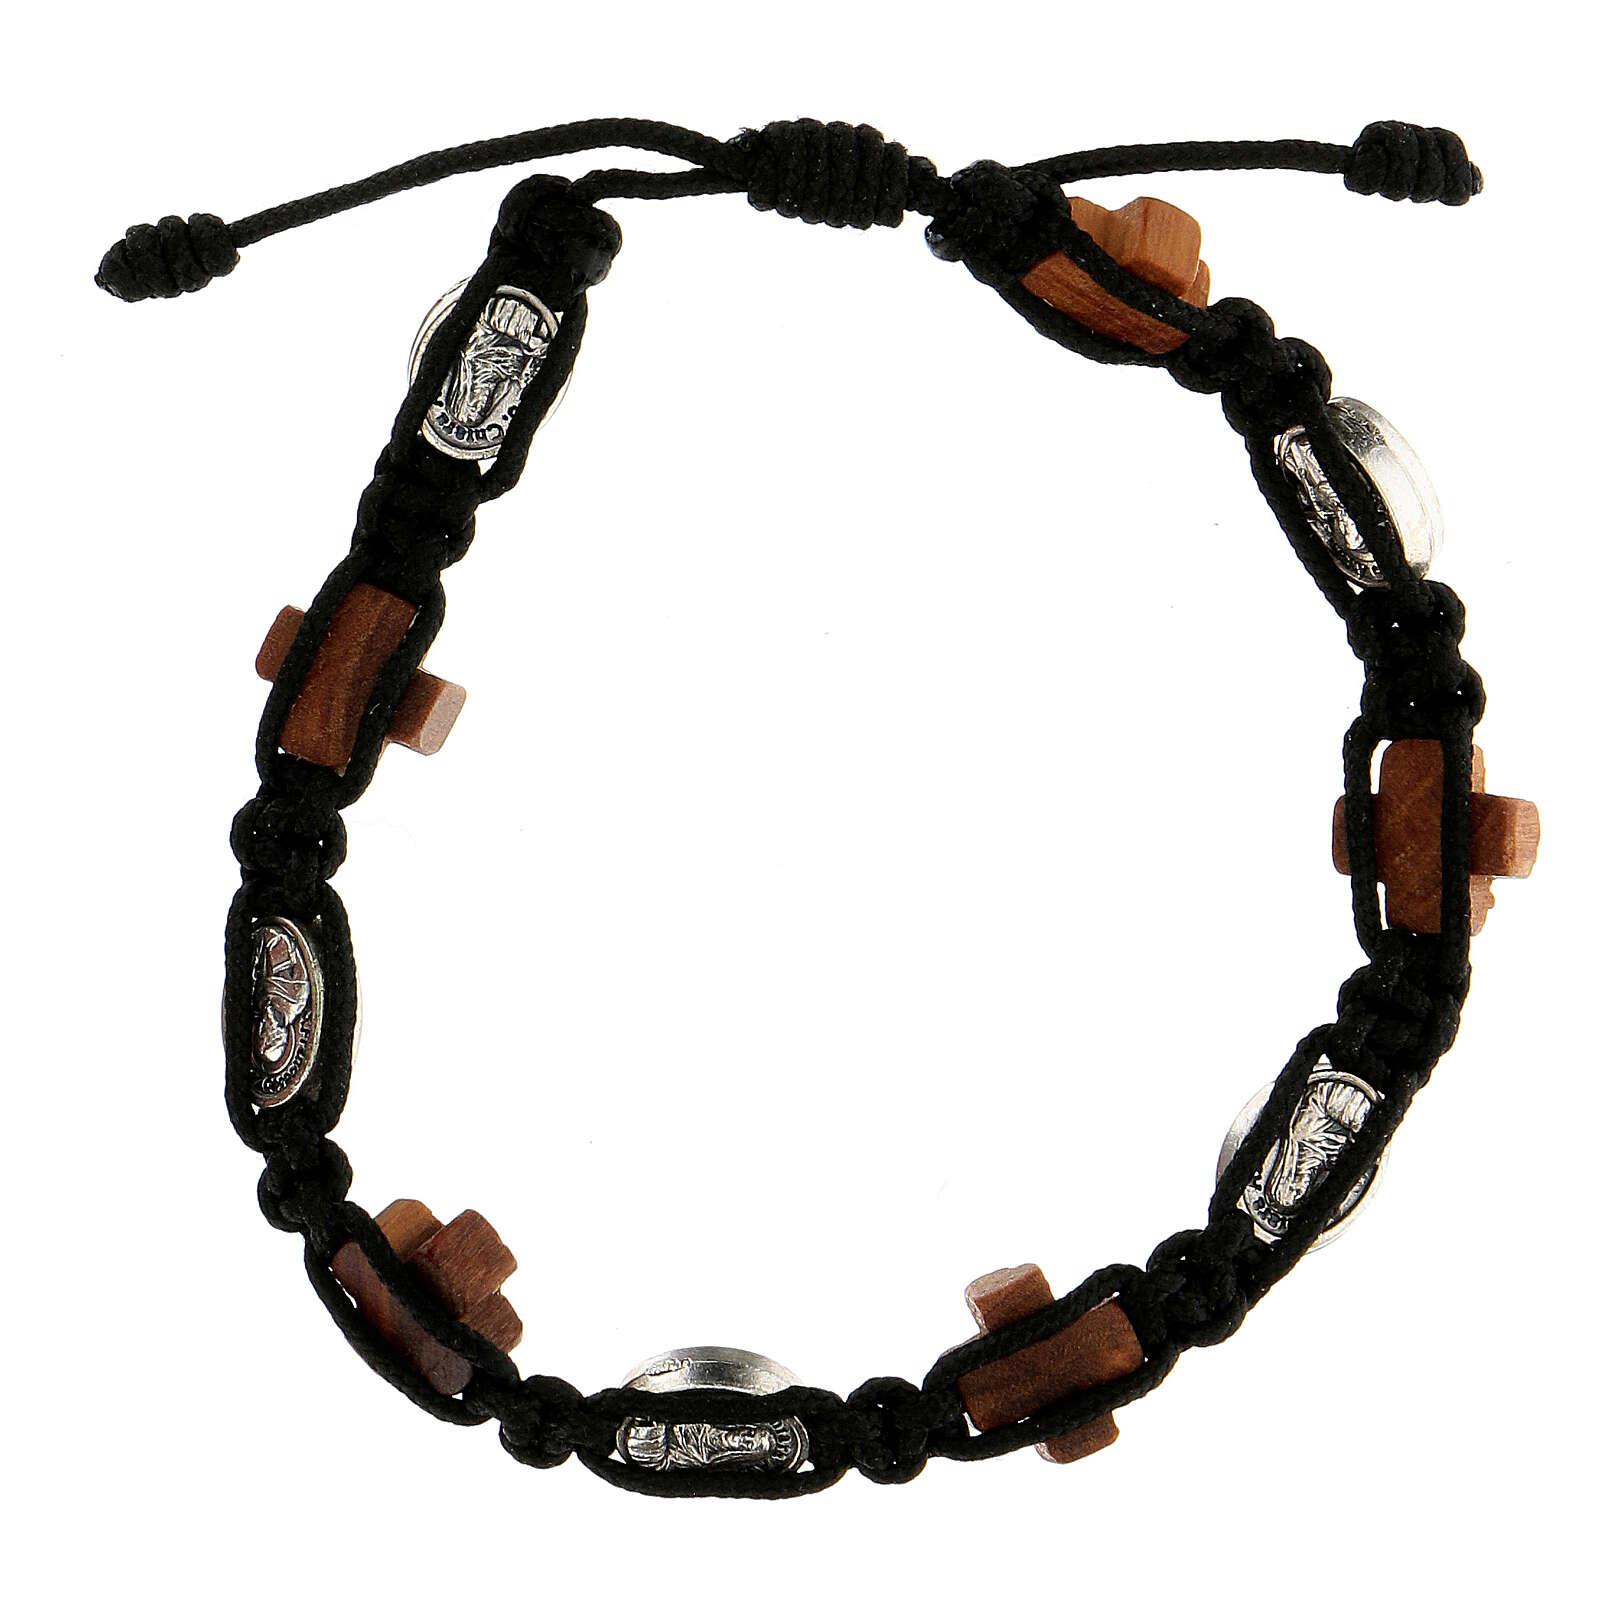 Bracelet Medjugorje corde noire médaille croix bois olivier 4